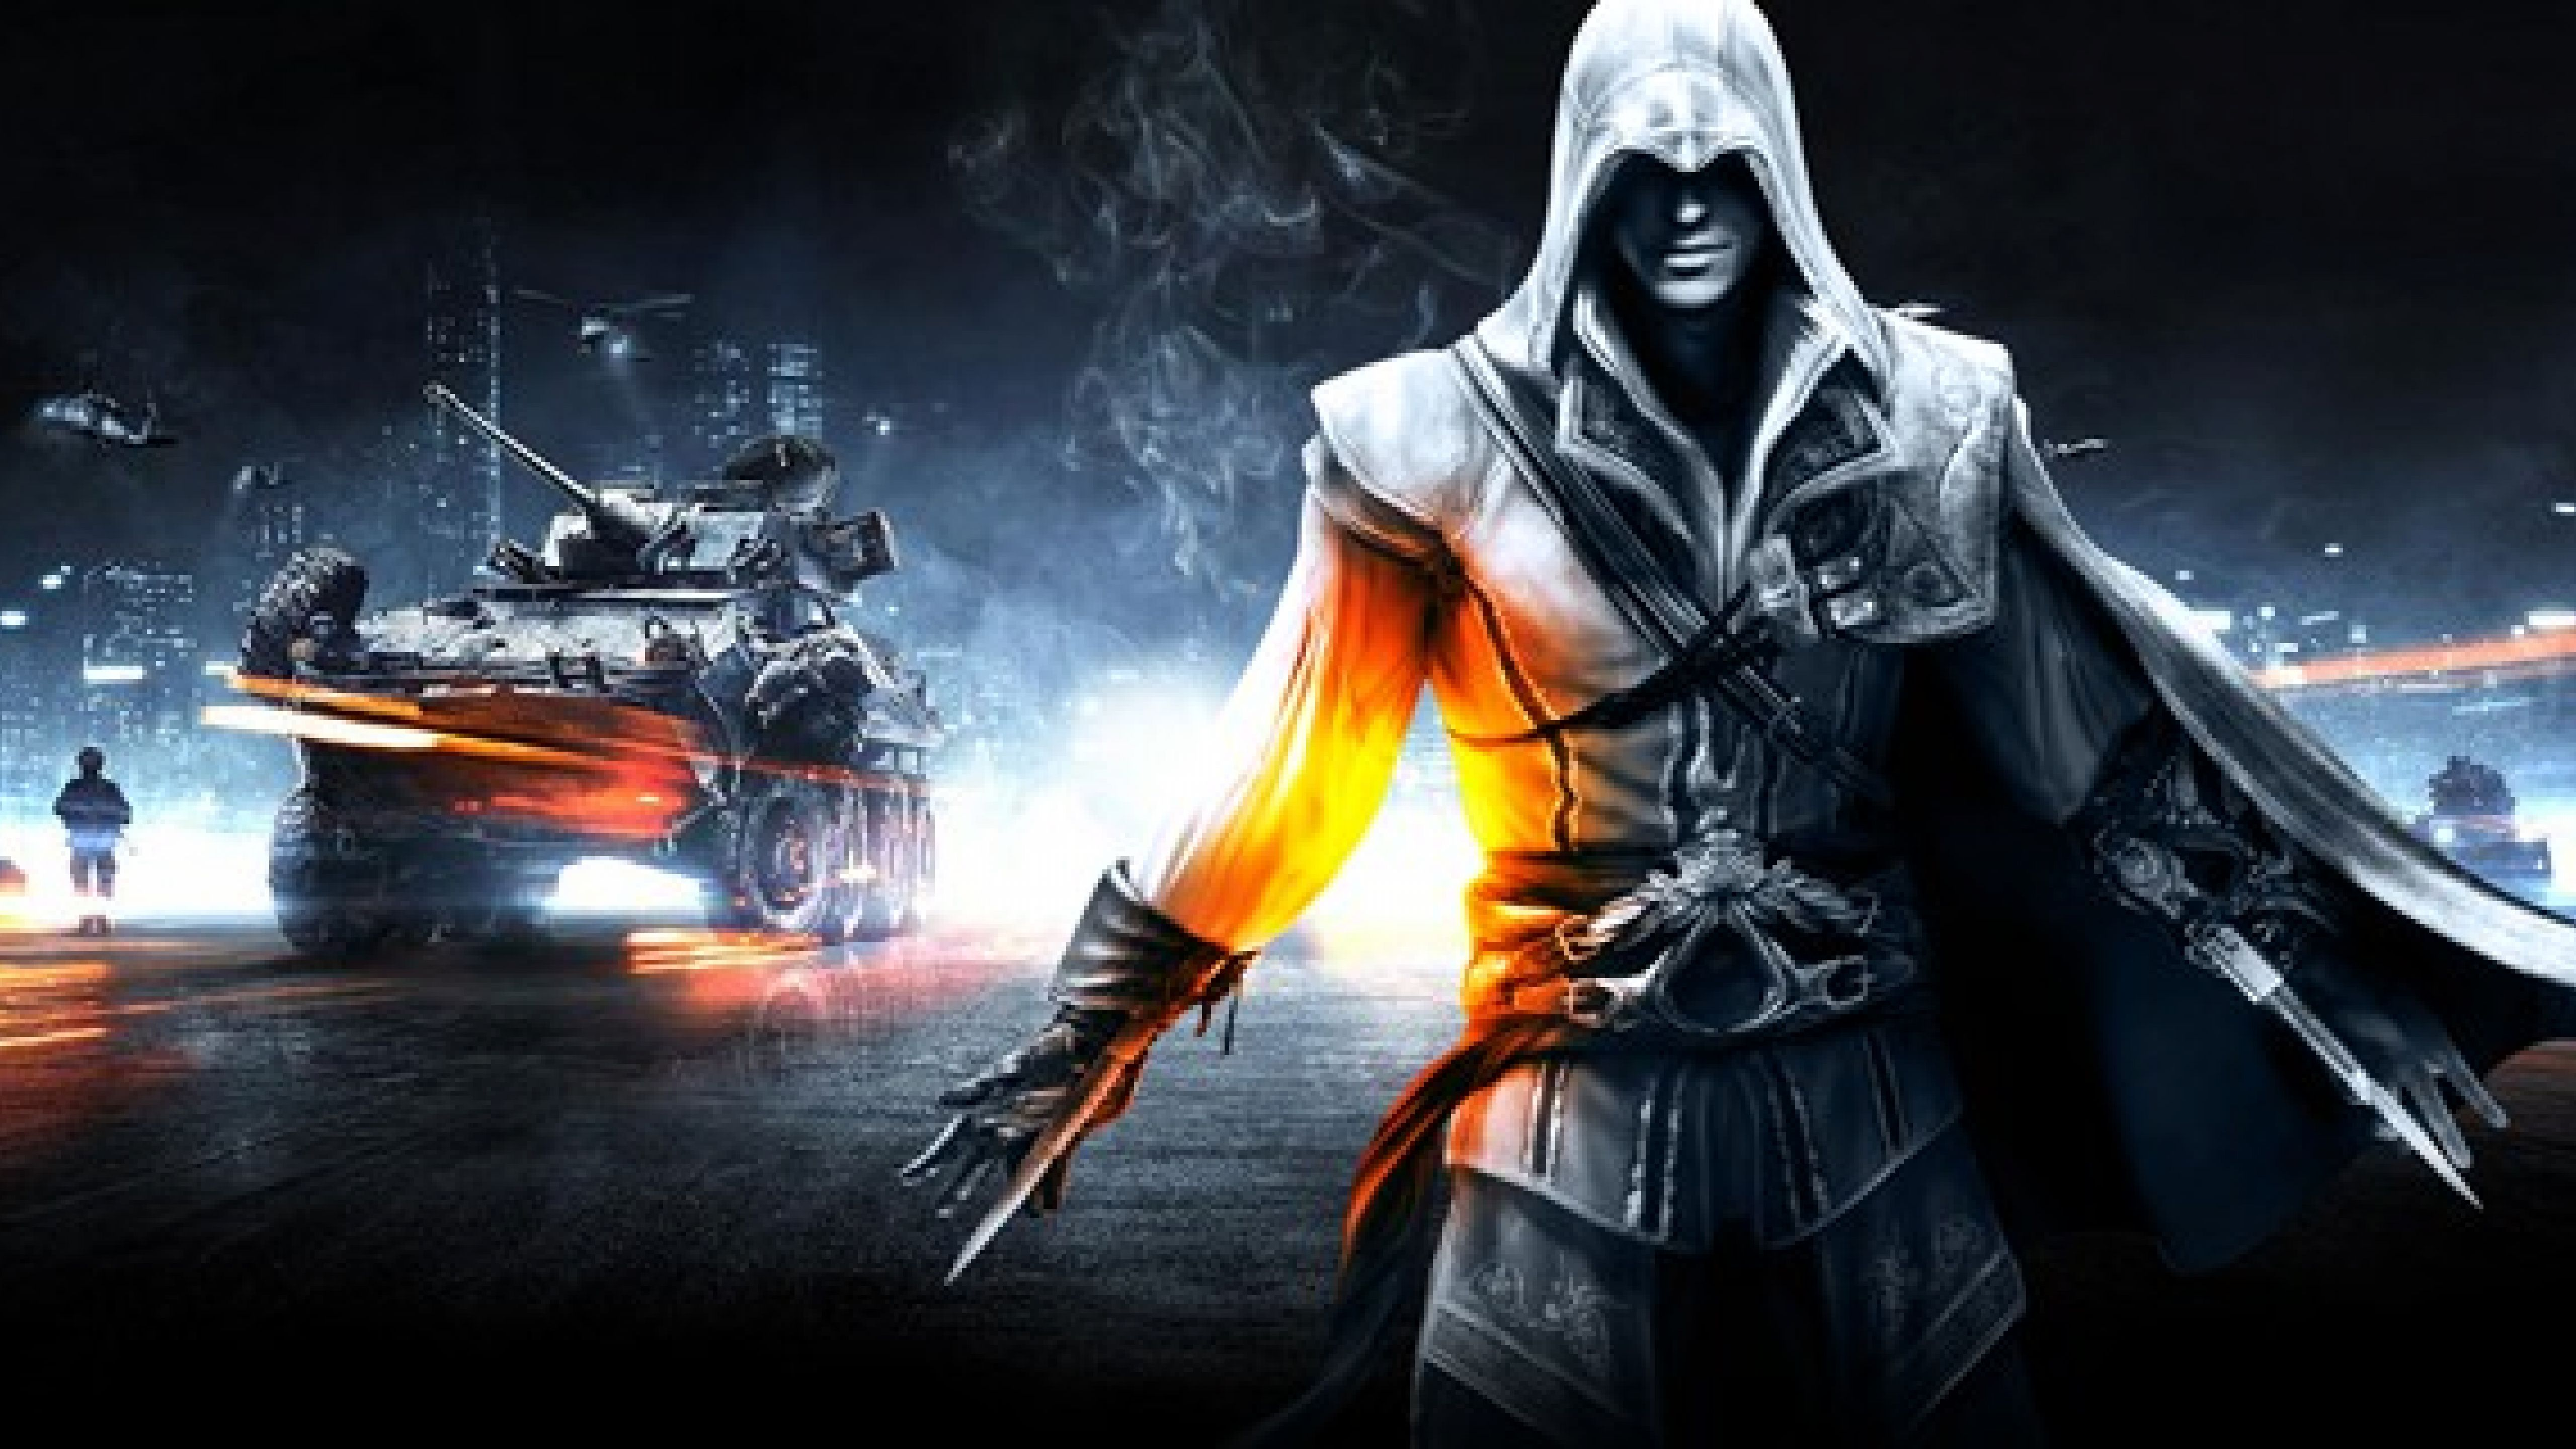 8k Gaming Wallpapers Top 8k Gaming Backgrounds   Gaming 4k 5120x2880